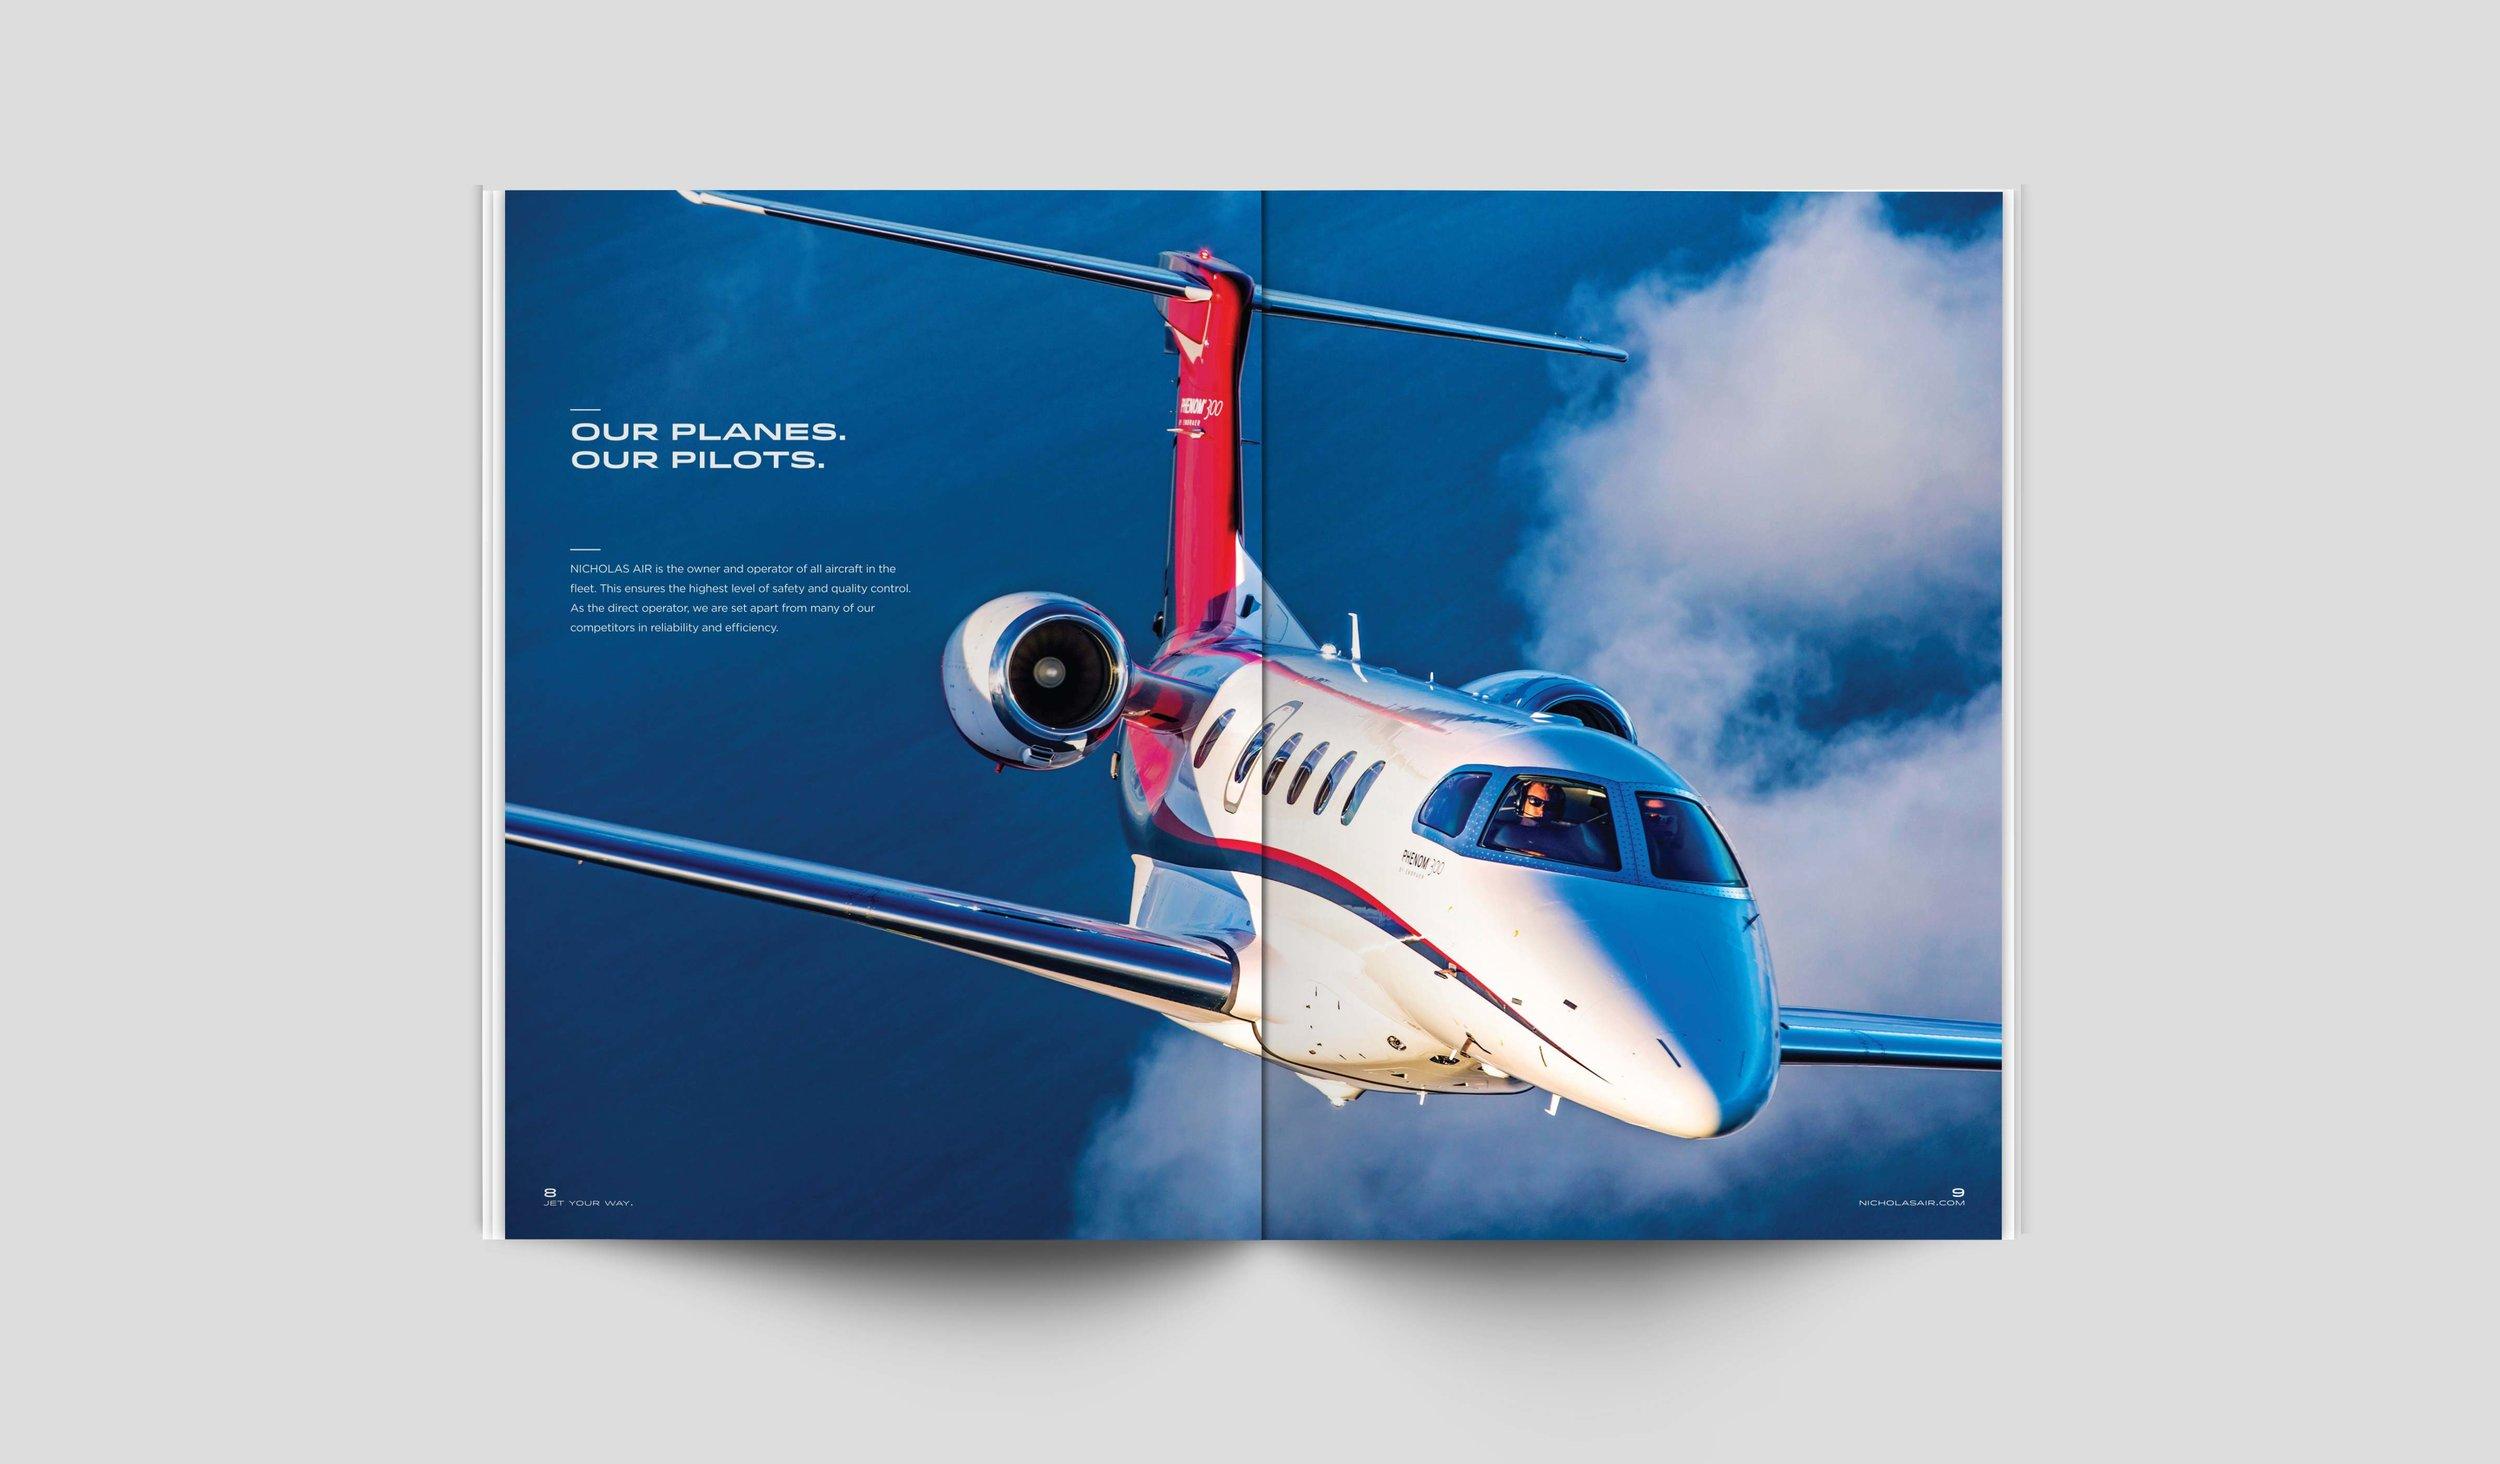 Nicholas-Air-Brochure_Spread-4.jpg